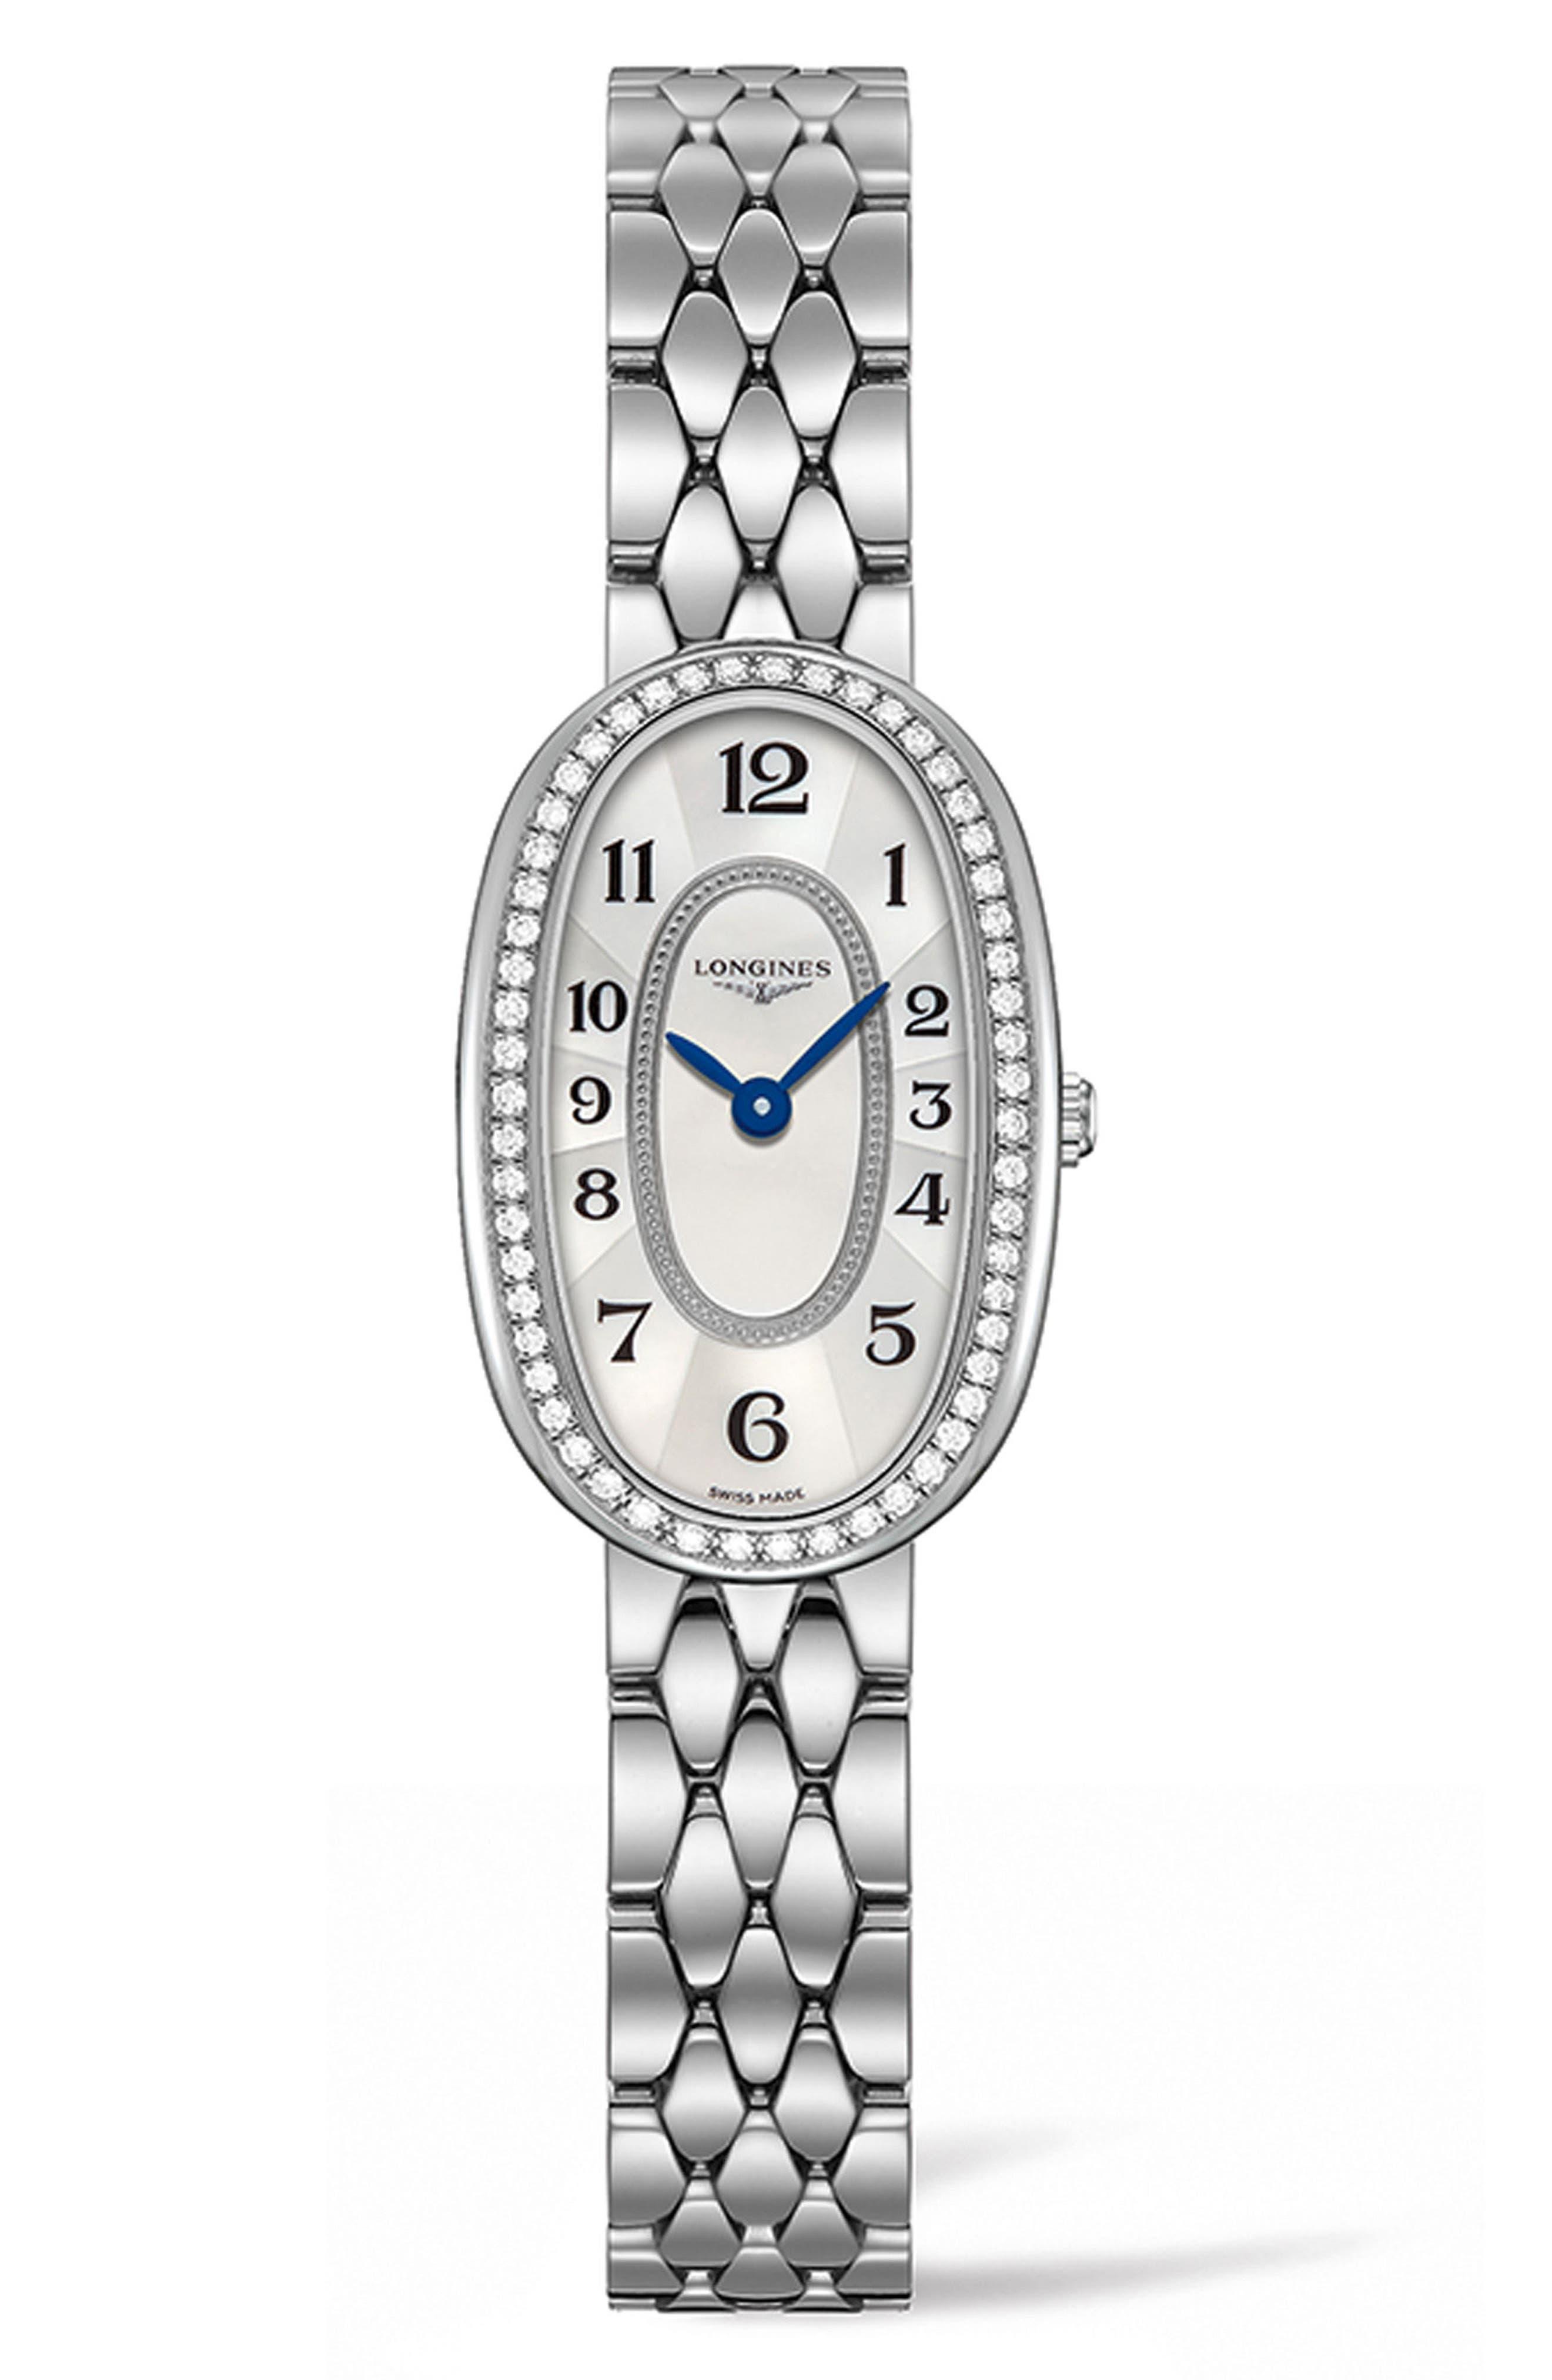 Main Image - Longines Symphonette Diamond Bracelet Watch, 18.9mm x 29.4mm